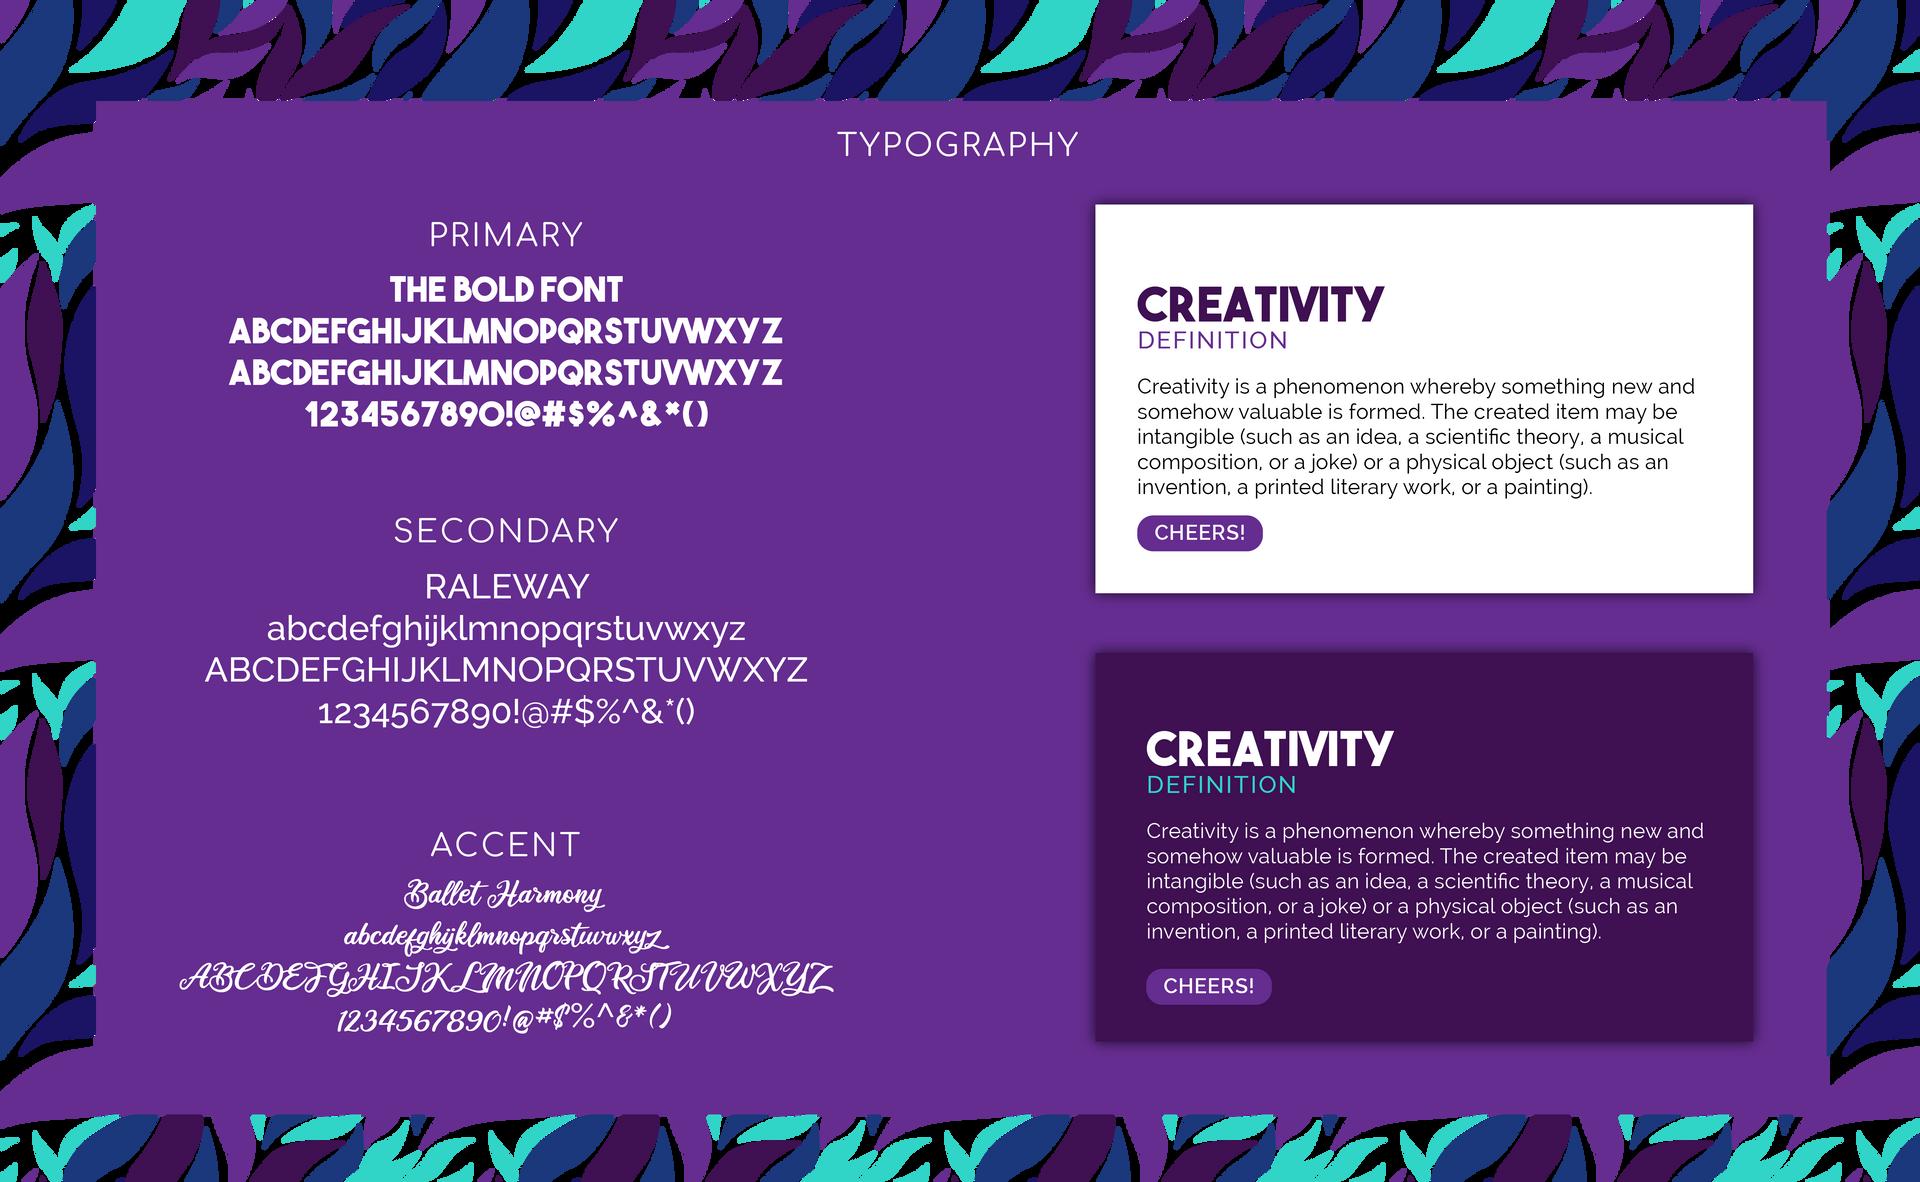 MVJC-BRND-002_BehanceC_03-Typography.png